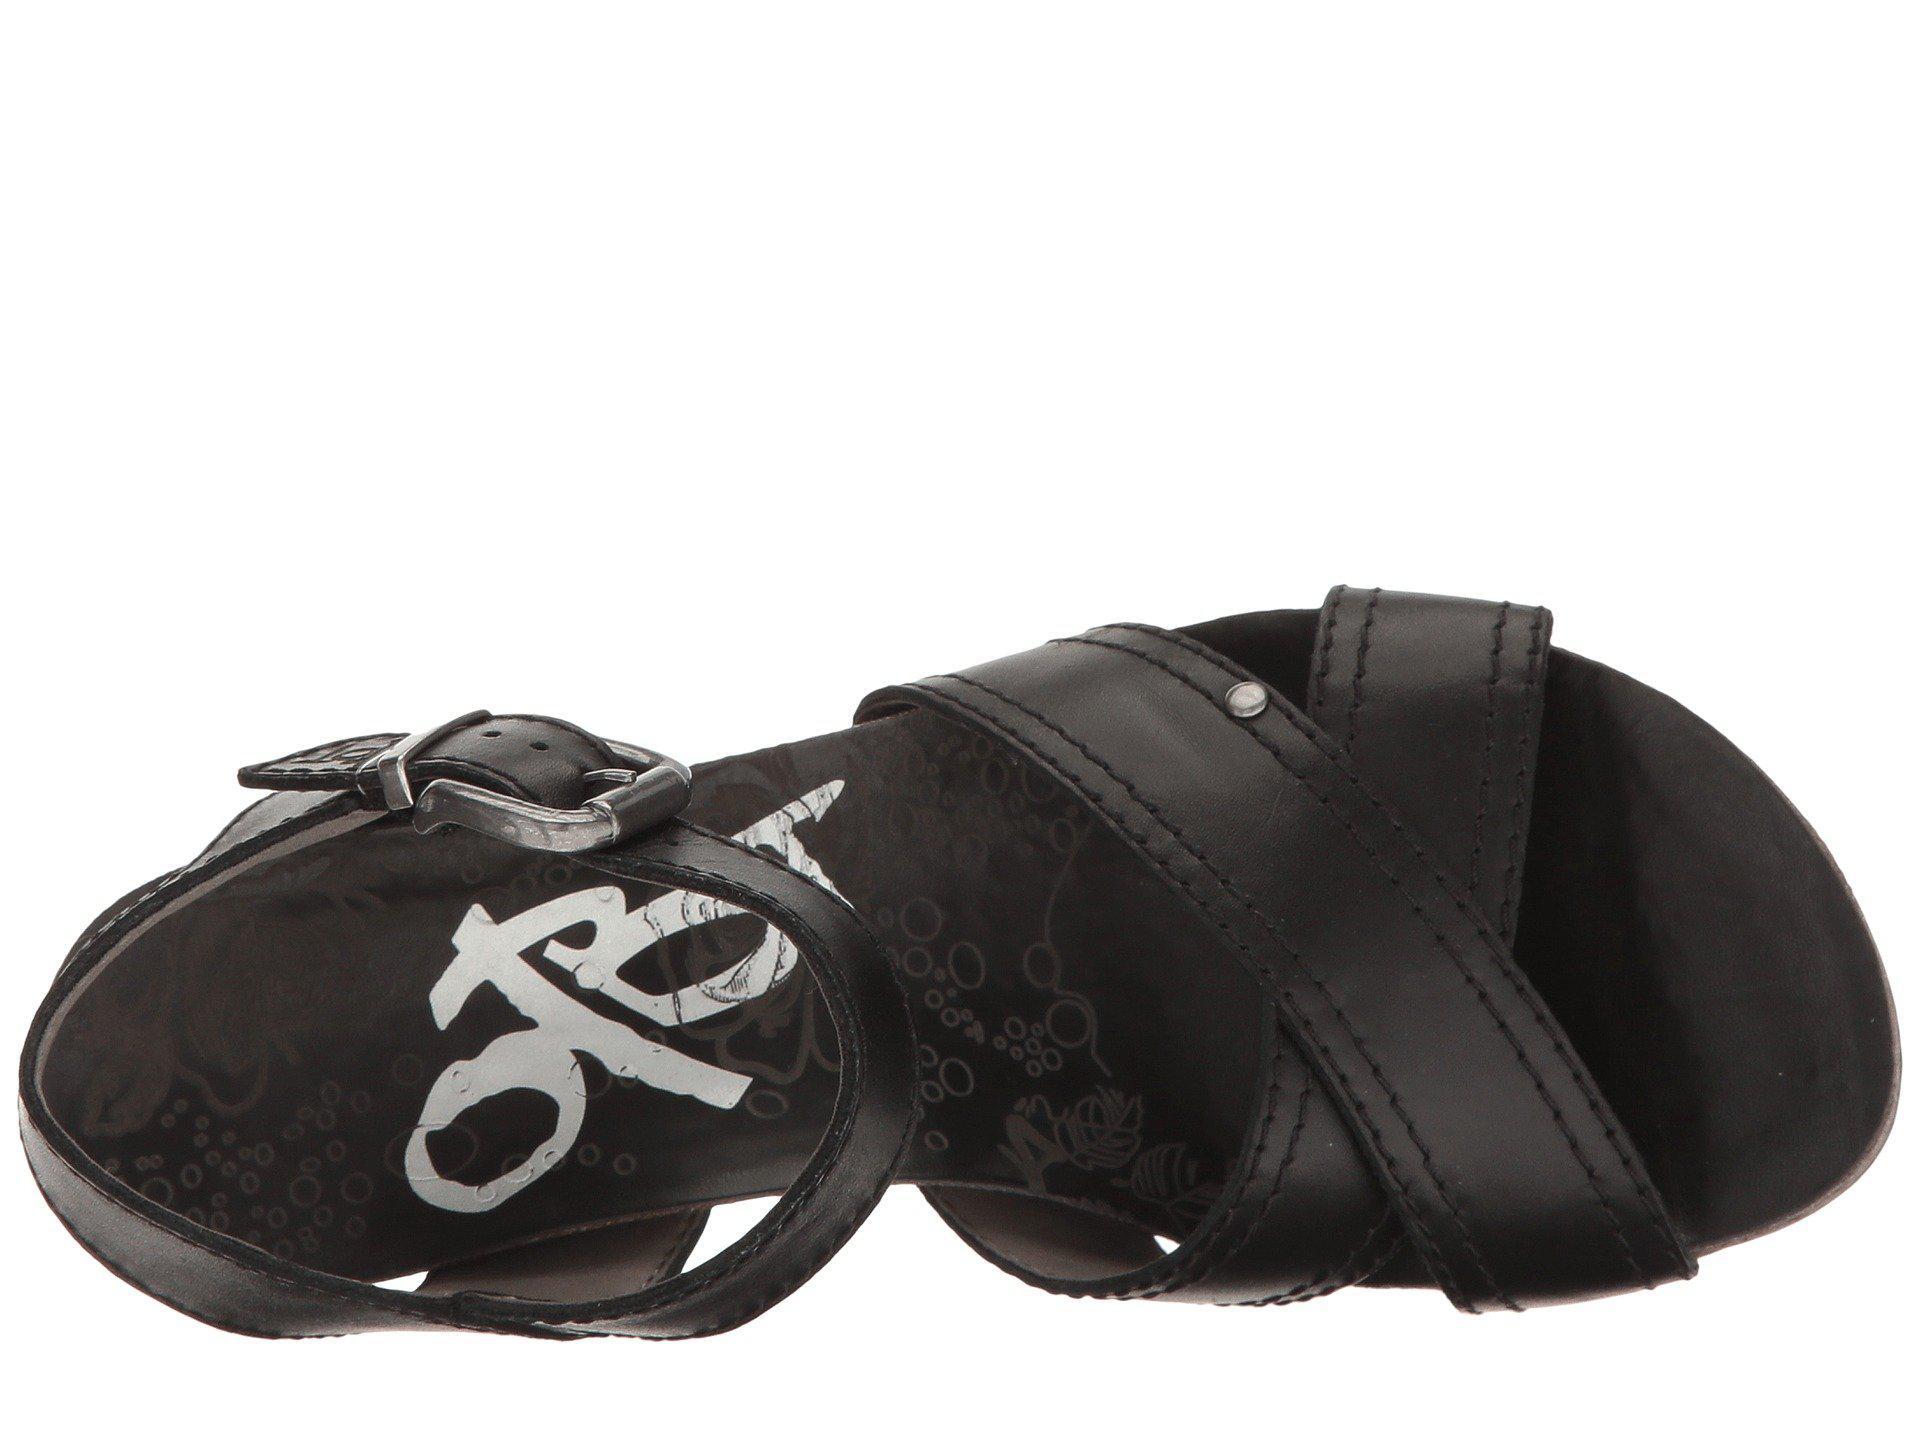 e3fb939ef50 Otbt - Bee Cave (black) Women s Wedge Shoes - Lyst. View fullscreen